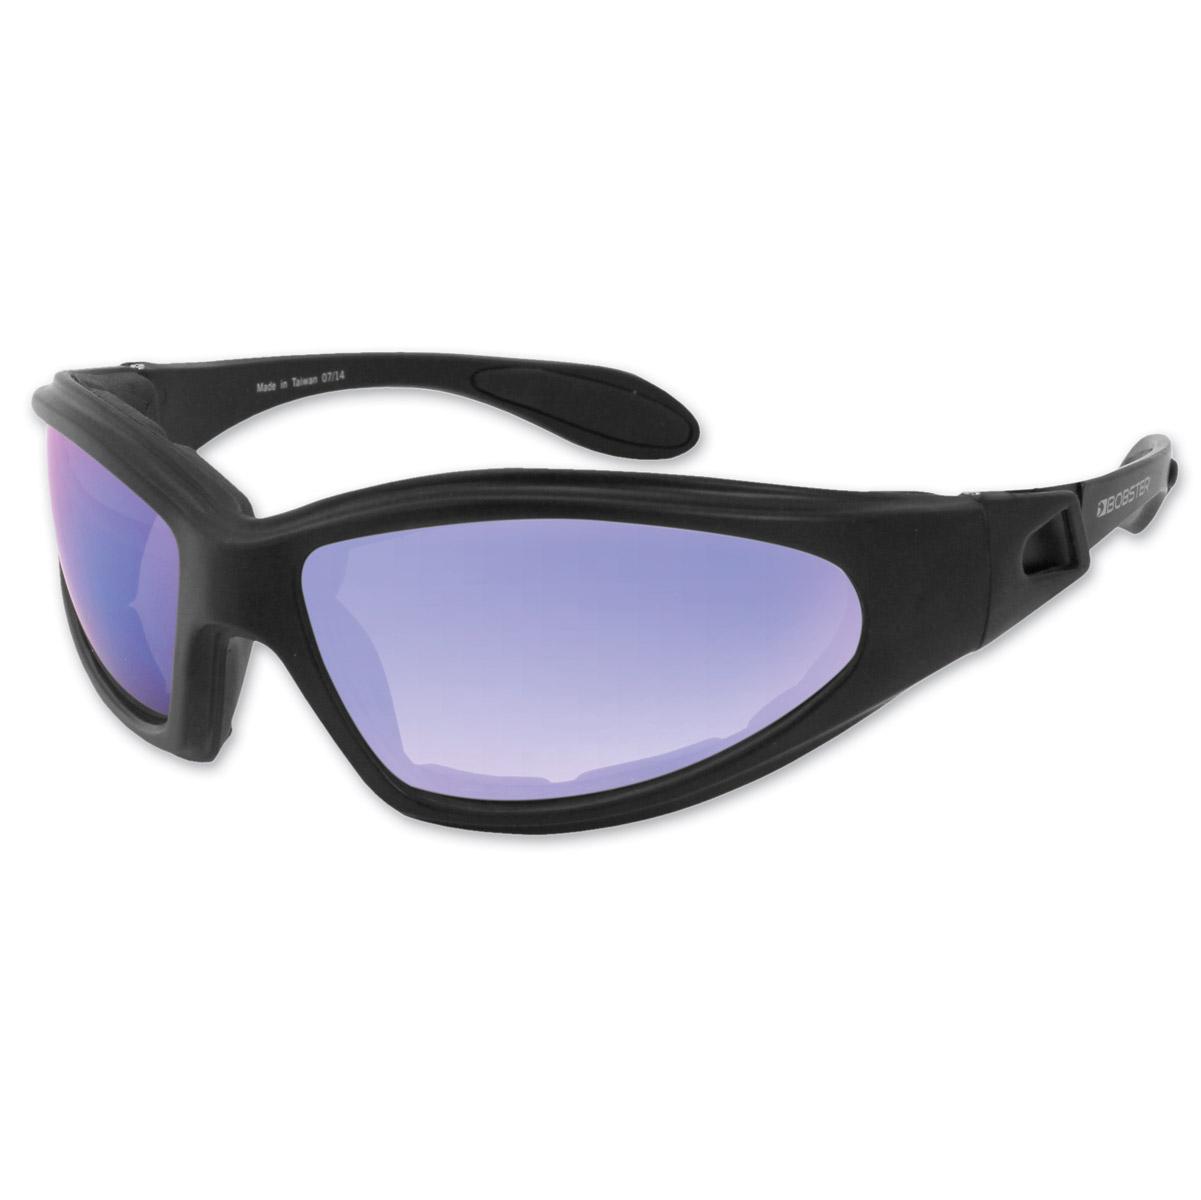 1db69f1f2600 Bobster GXR Black Frame Sunglasses w  Smoked Blue Mirror Lens ...